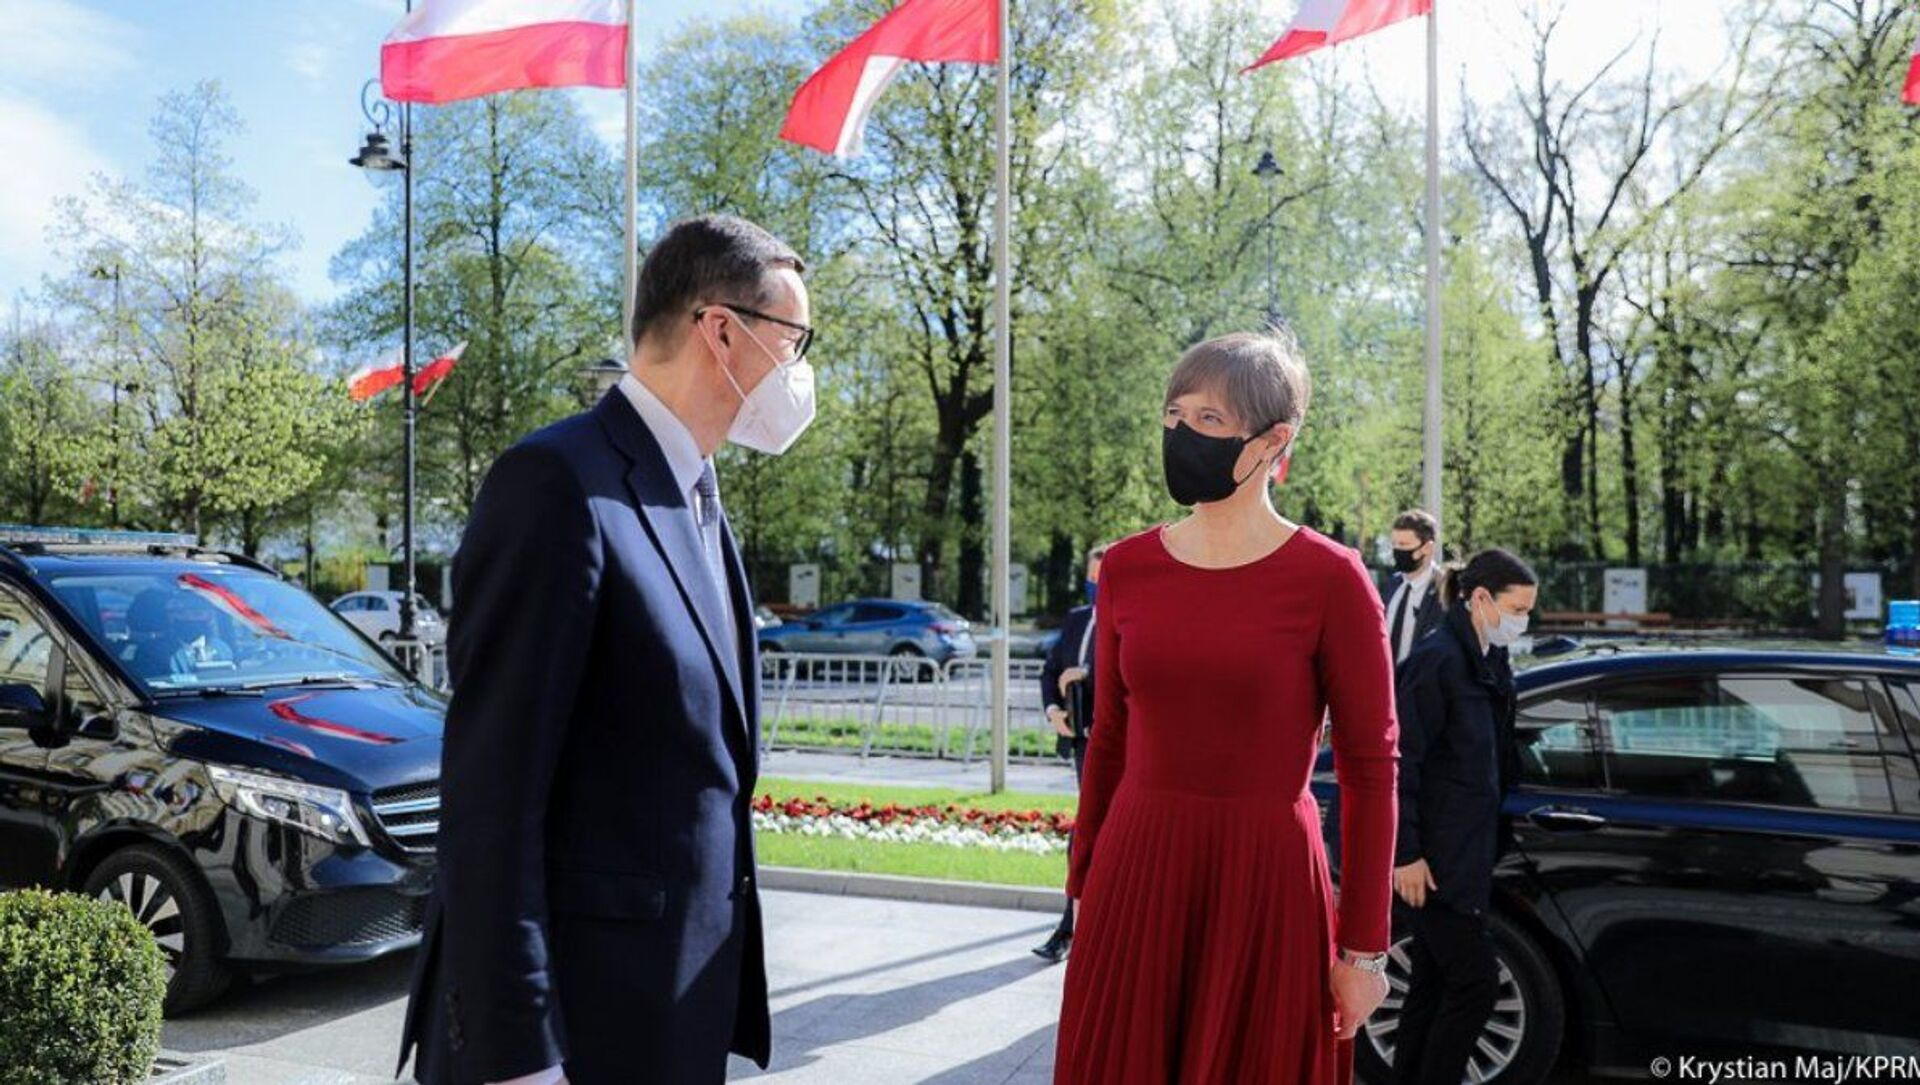 Spotkanie Morawieckiego i Kaljulaid - Sputnik Polska, 1920, 05.05.2021